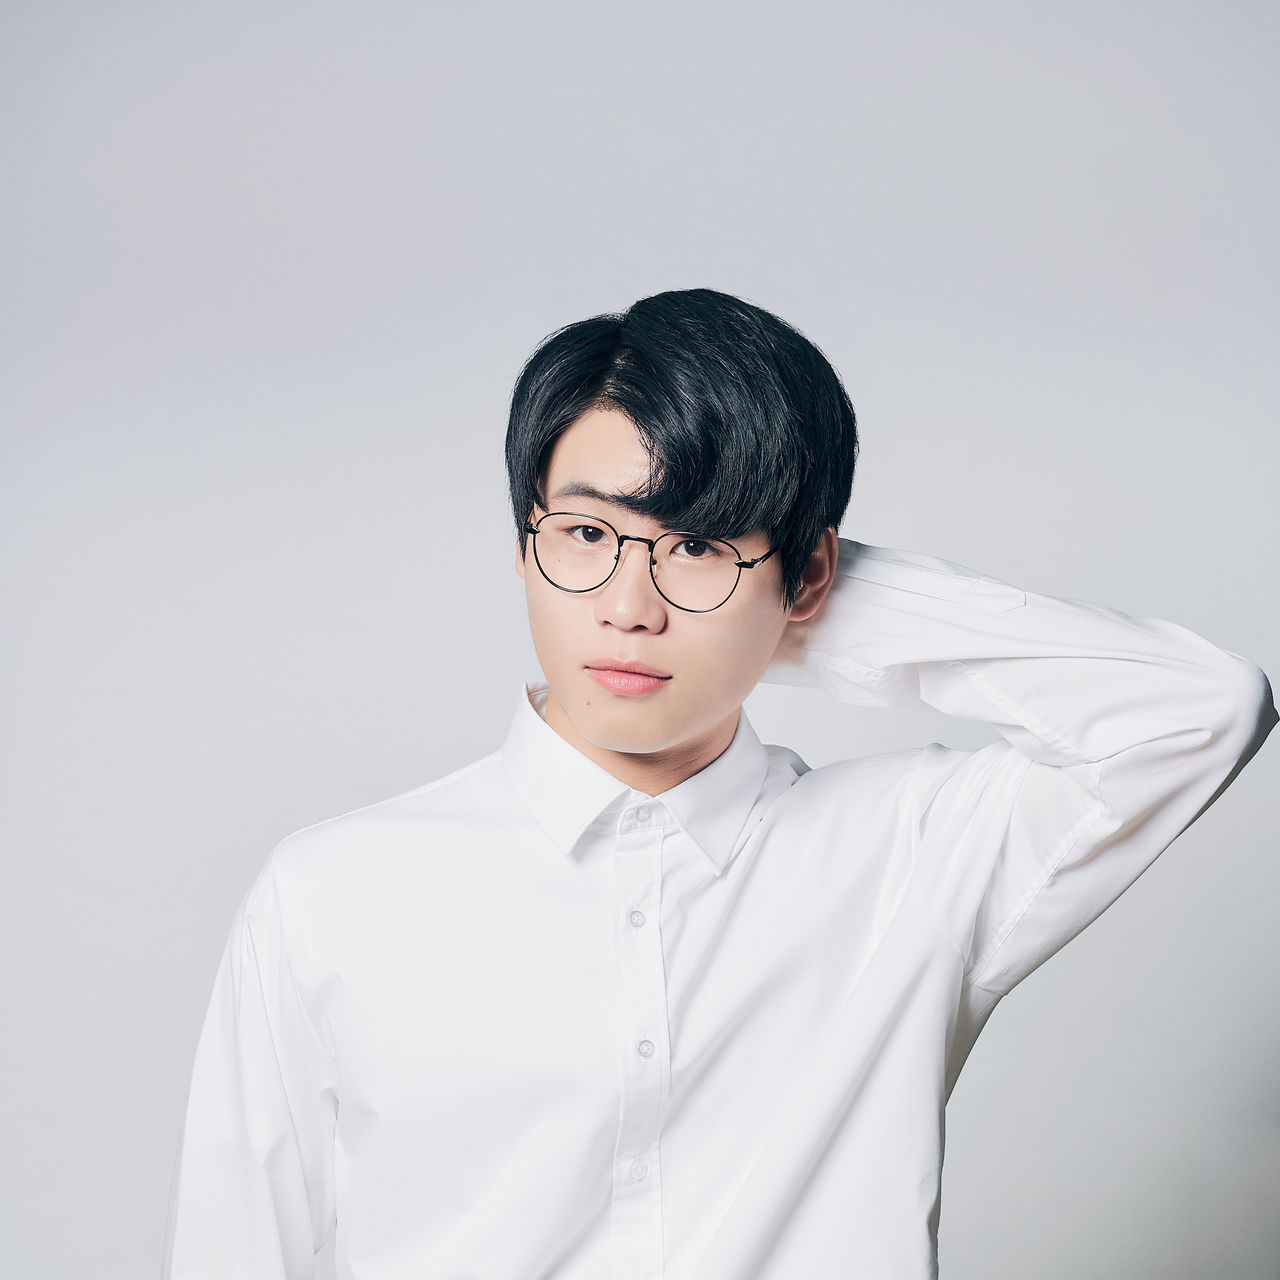 <b>Park Myung Yeon</b><br>Lead Fundraiser<br>